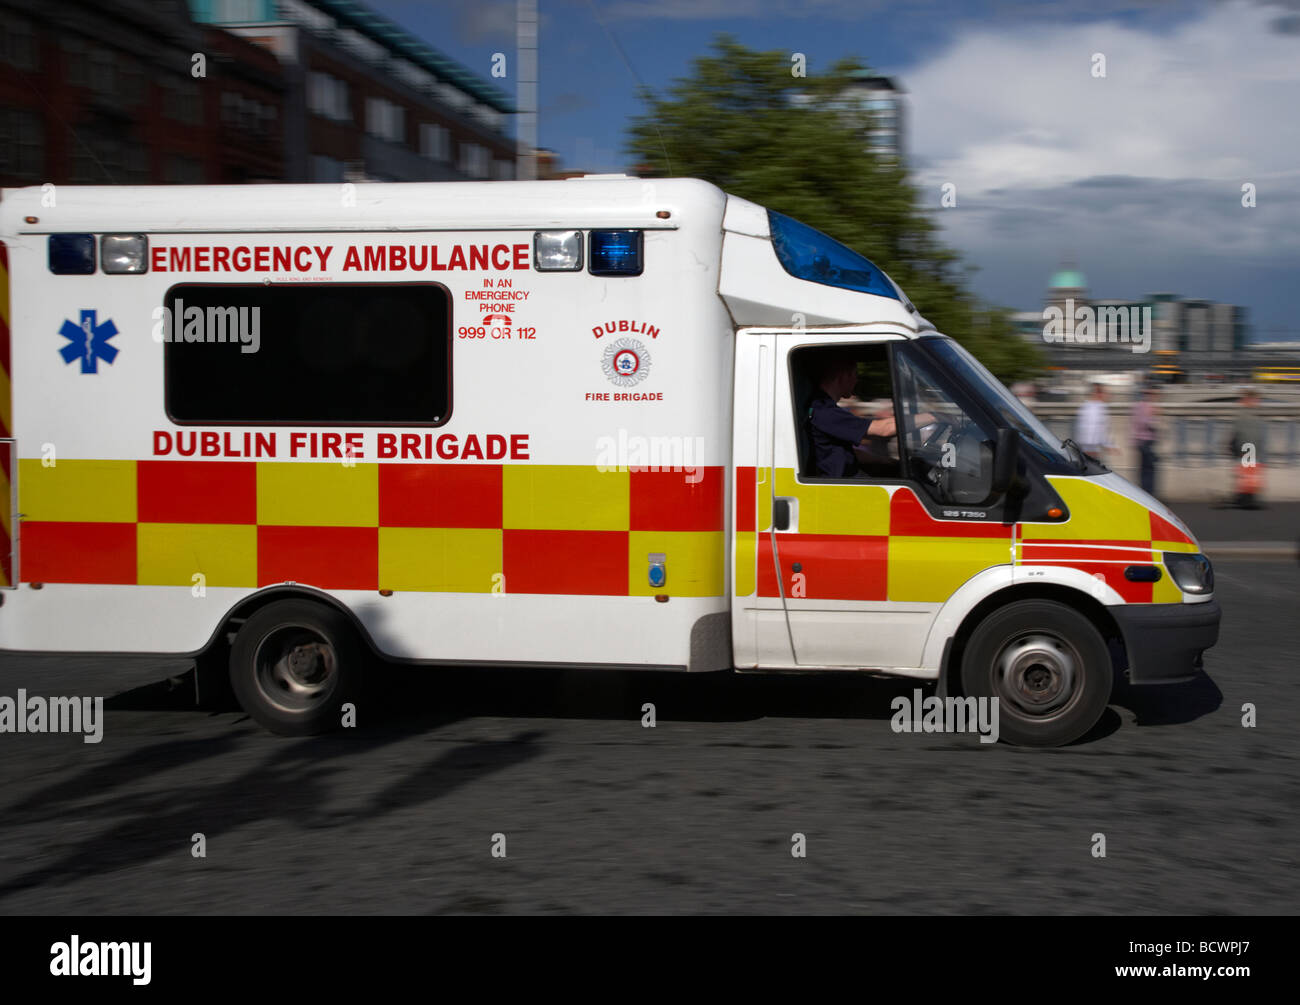 emergency ambulance from the dublin fire brigade rushing through dublin city centre republic of ireland - Stock Image